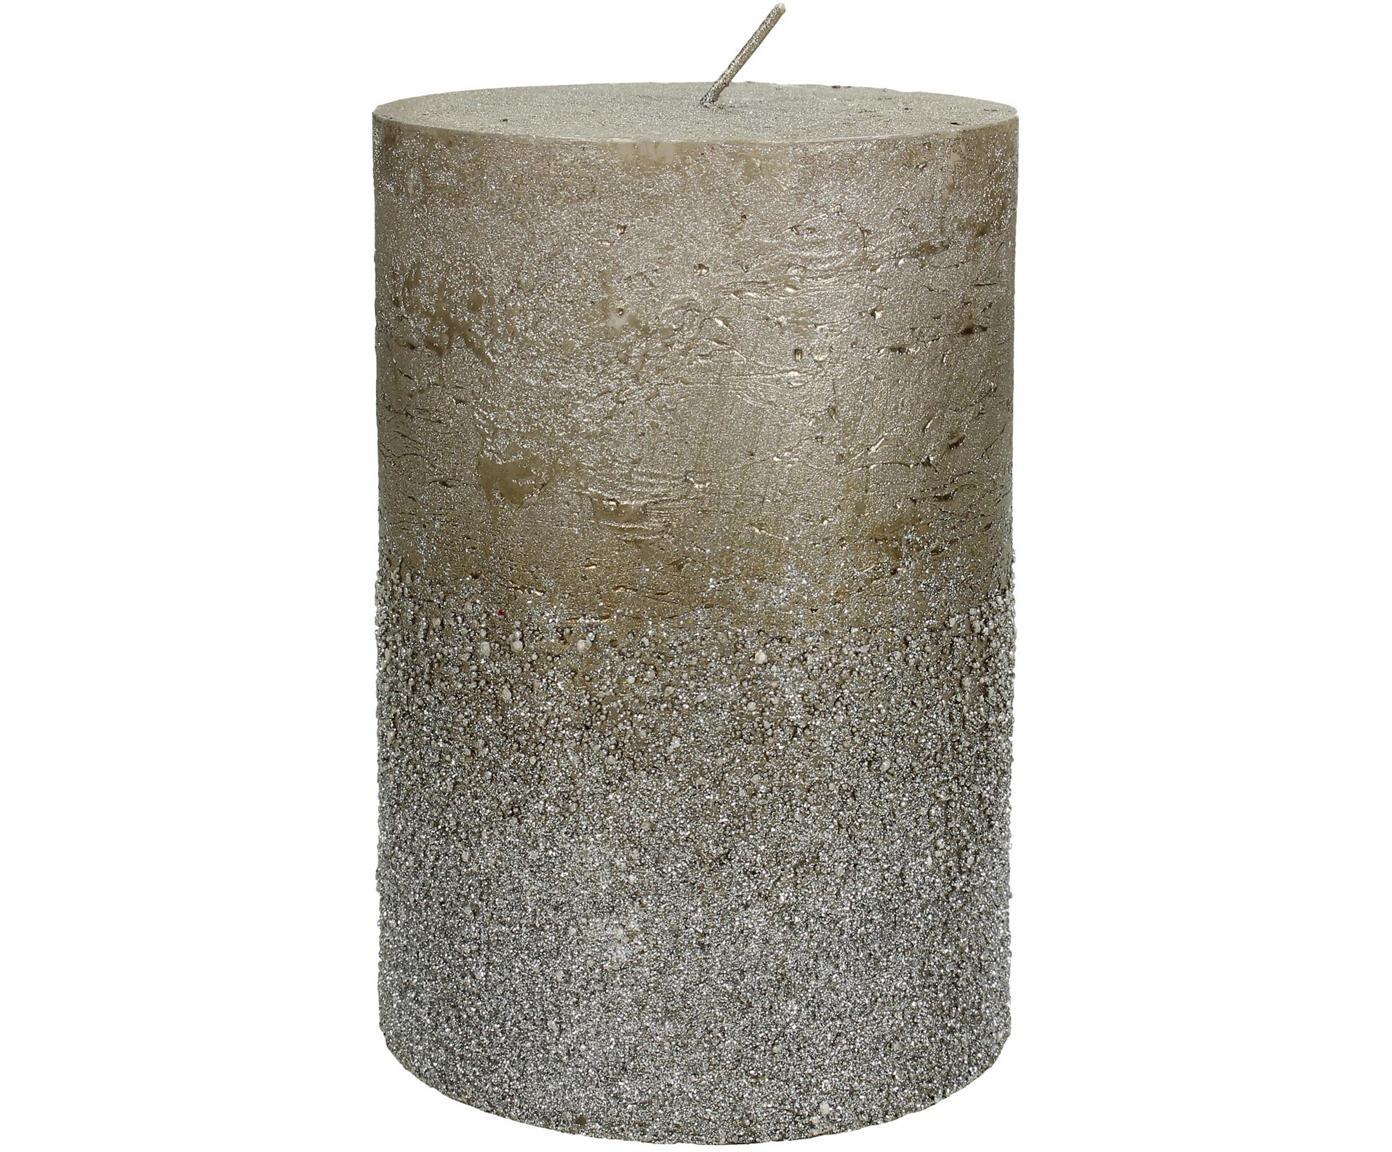 Stompkaars Glitters, Was, Grijs, Ø 10 cm